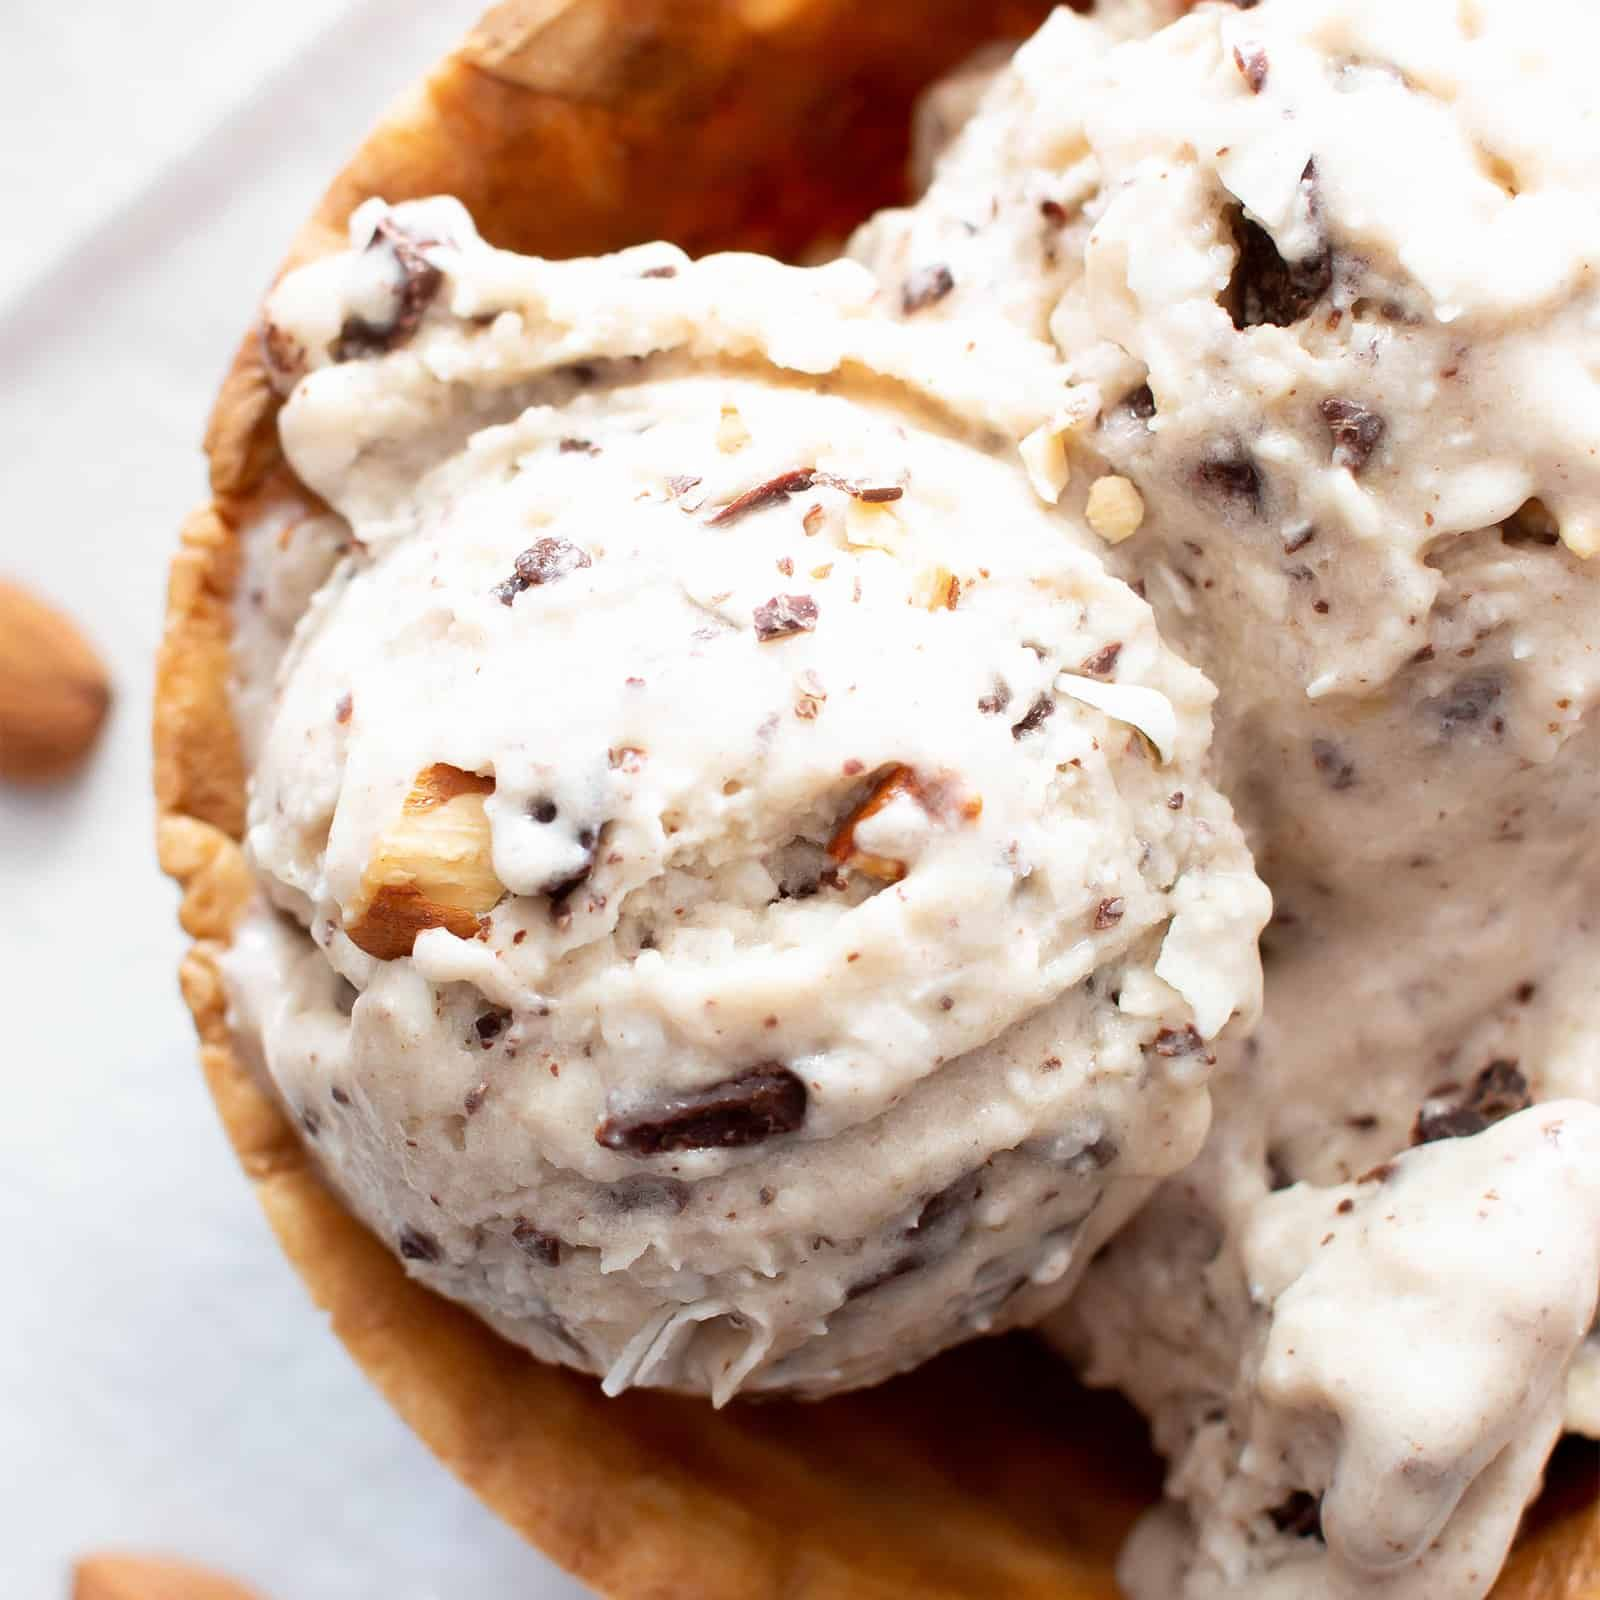 Almond Joy Vegan Paleo Ice Cream Recipe Refined Sugar Free